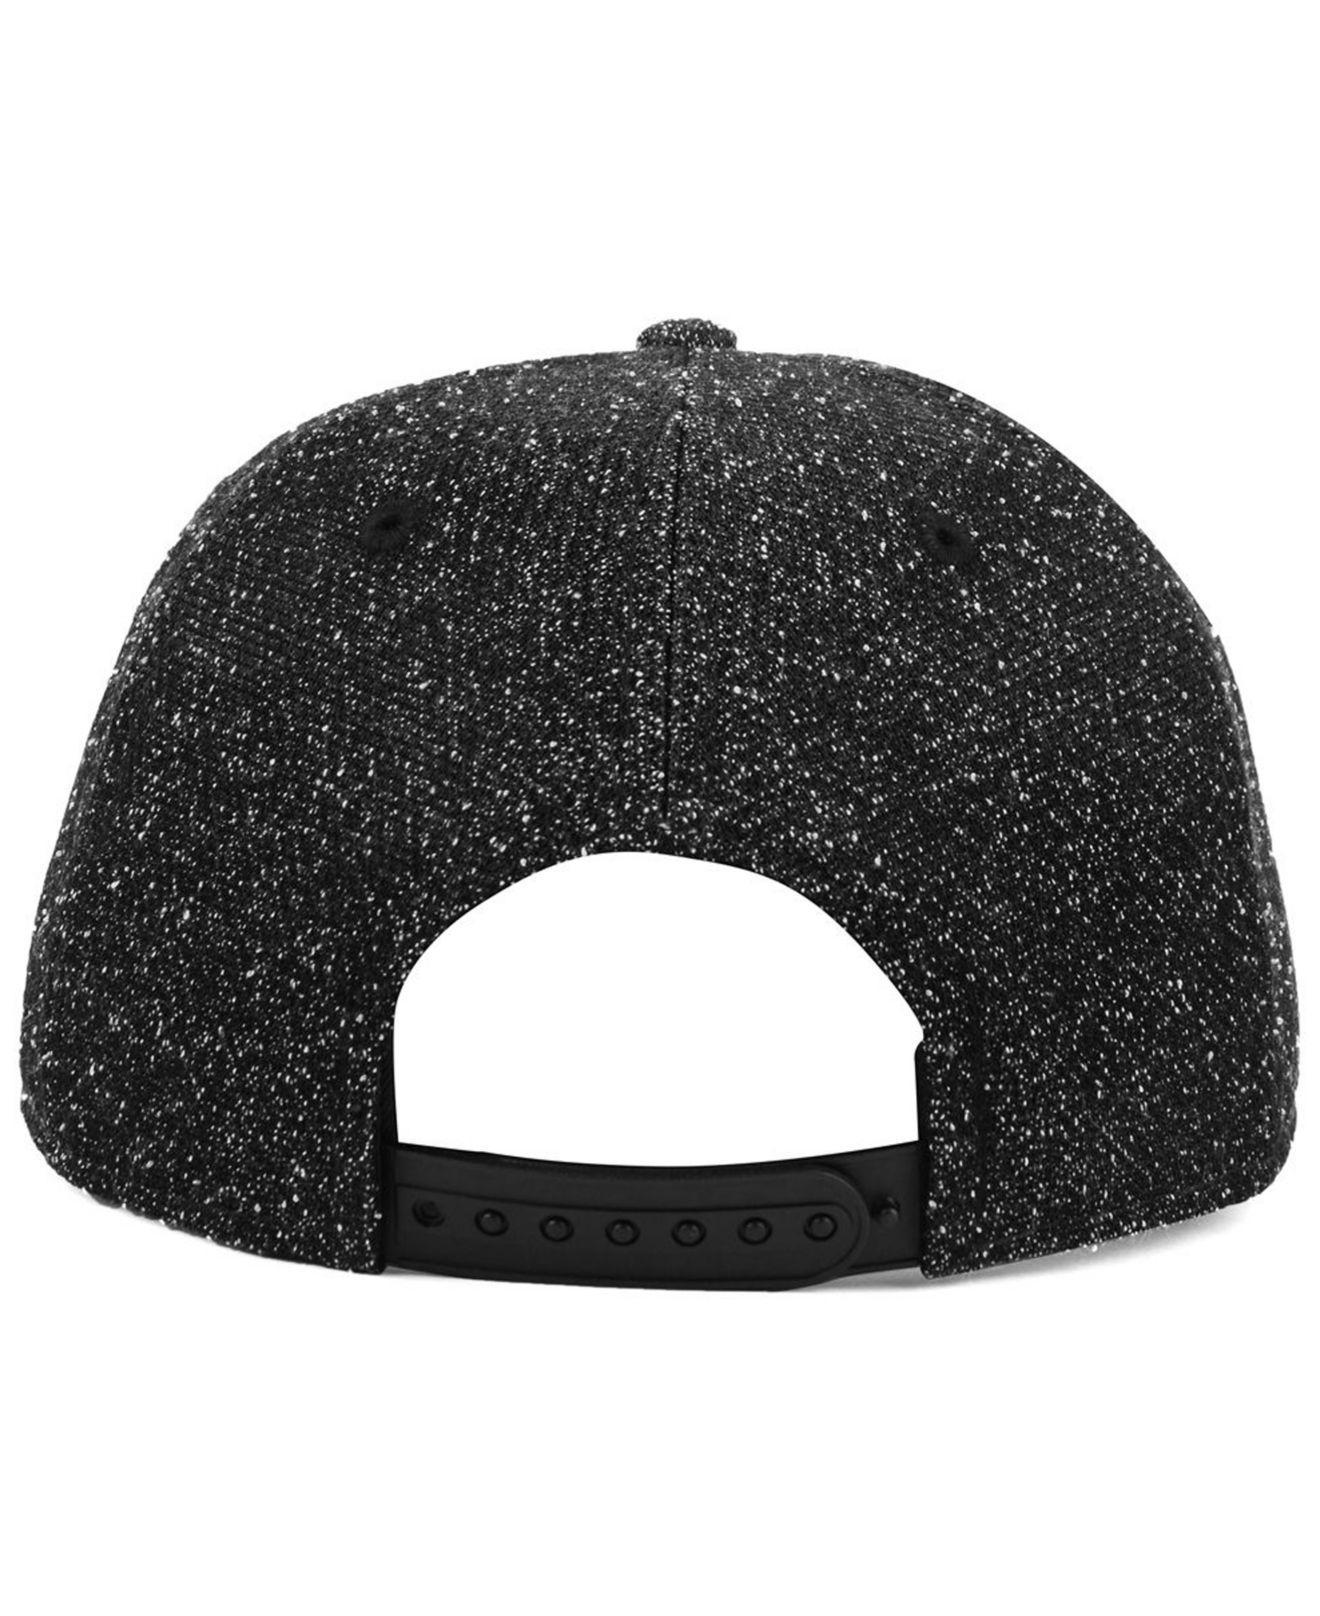 5766f8b9483 Lyst - KTZ Philadelphia Phillies Spec 9fifty Snapback Cap in Black ...